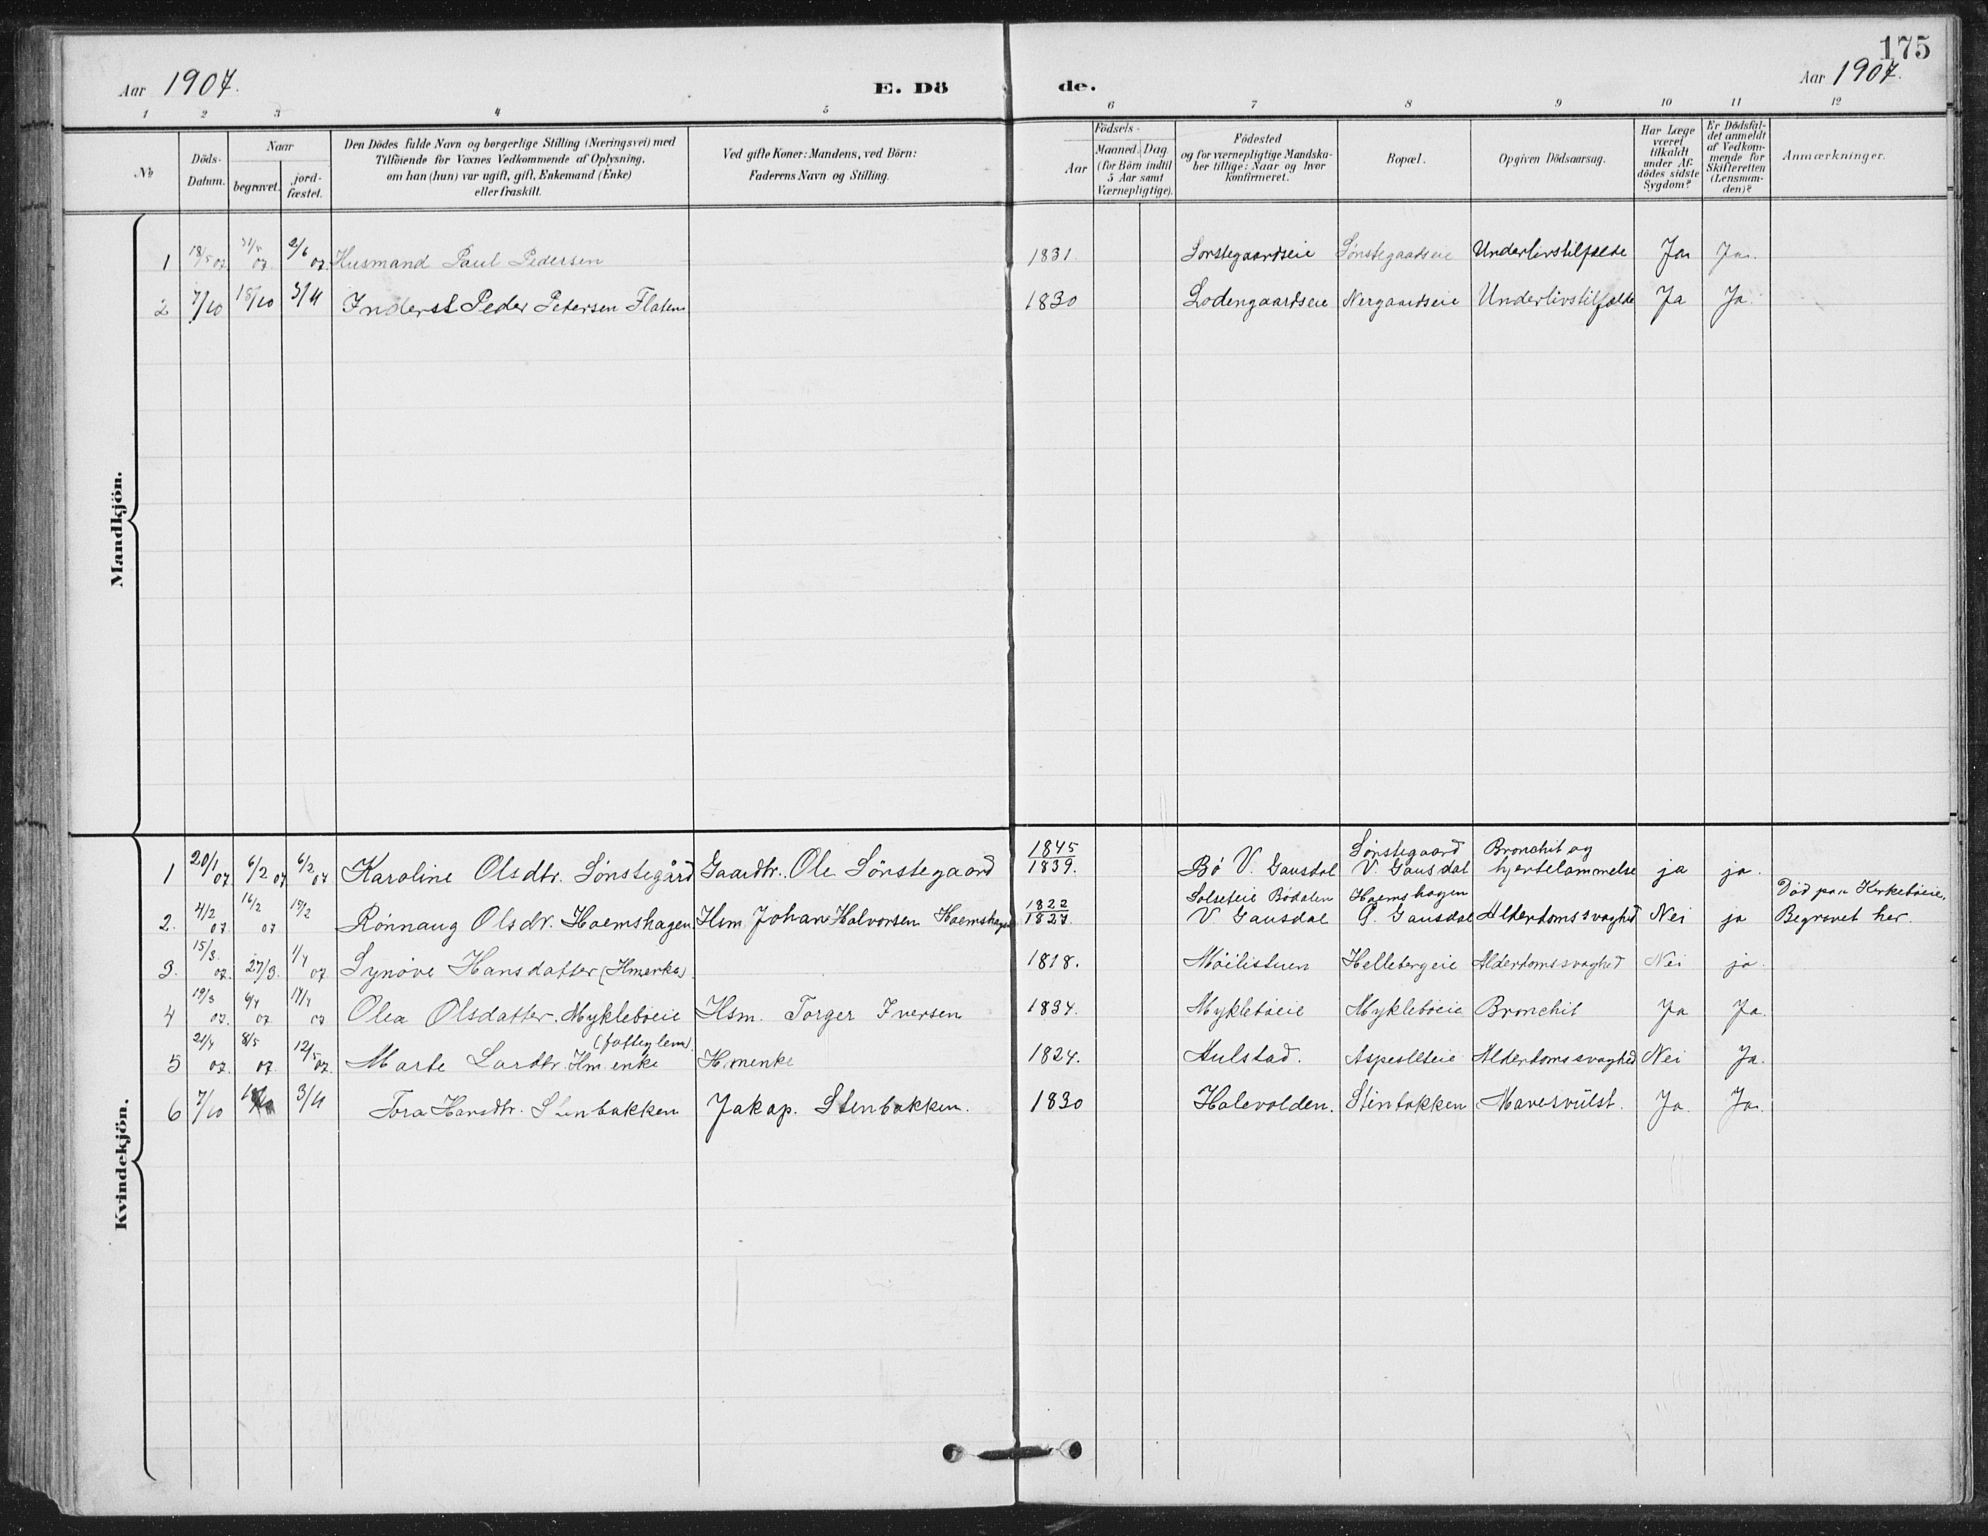 SAH, Vestre Gausdal prestekontor, Klokkerbok nr. 4, 1898-1939, s. 175